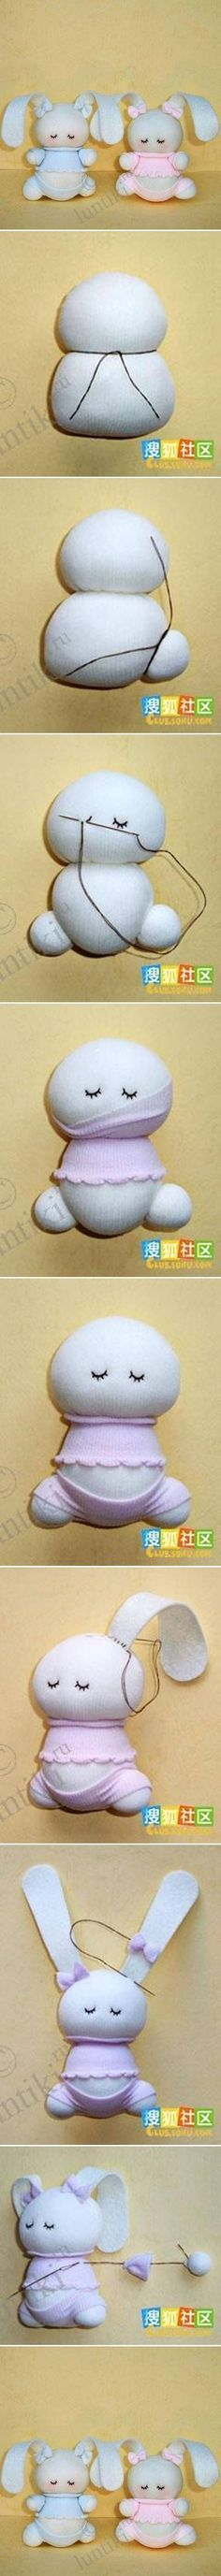 DIY Adorable Sock Bunny DIY Adorable Sock Bunny: